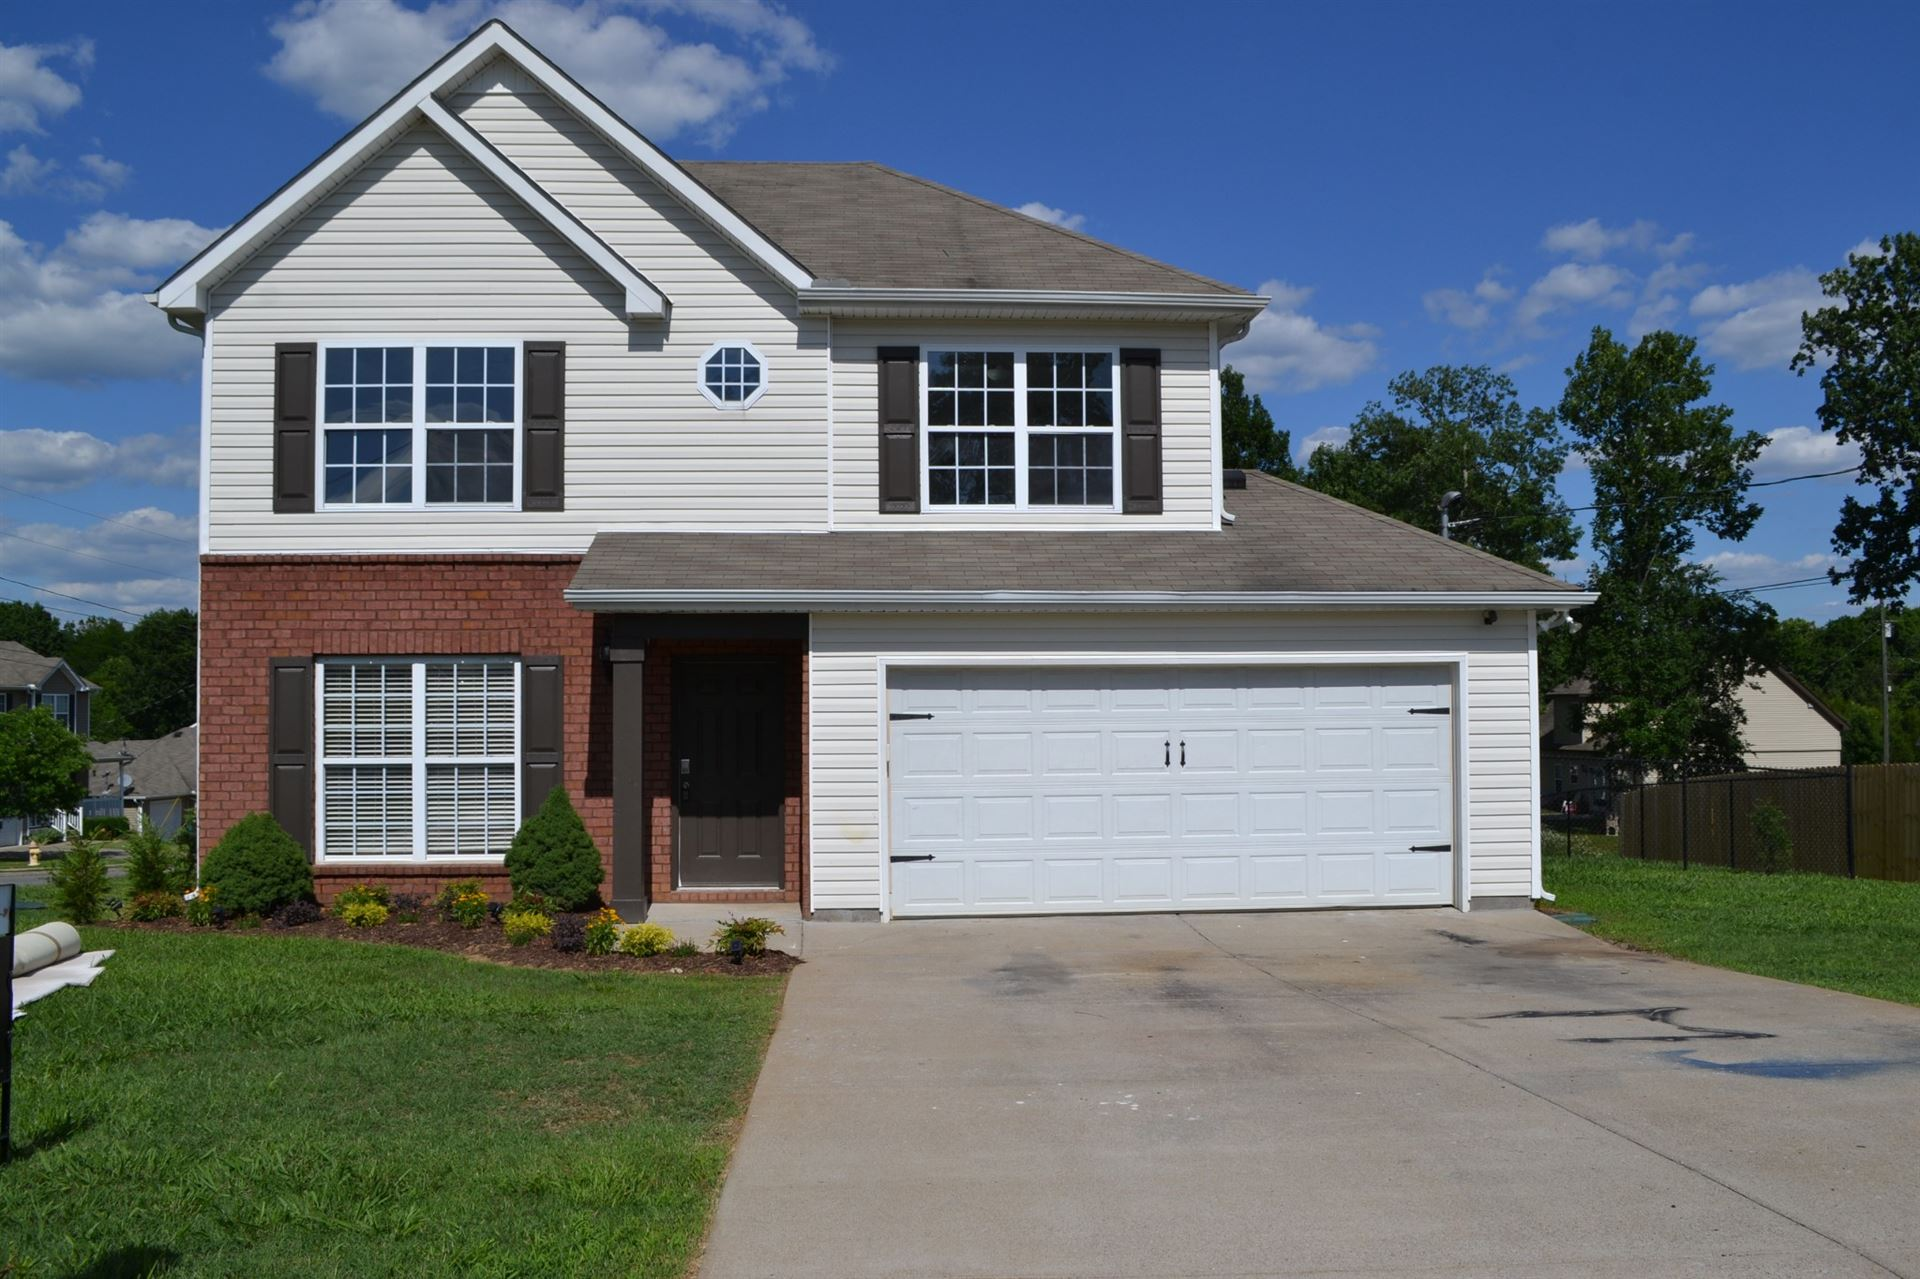 Photo of 1116 Niagra Ct, Murfreesboro, TN 37129 (MLS # 2263303)